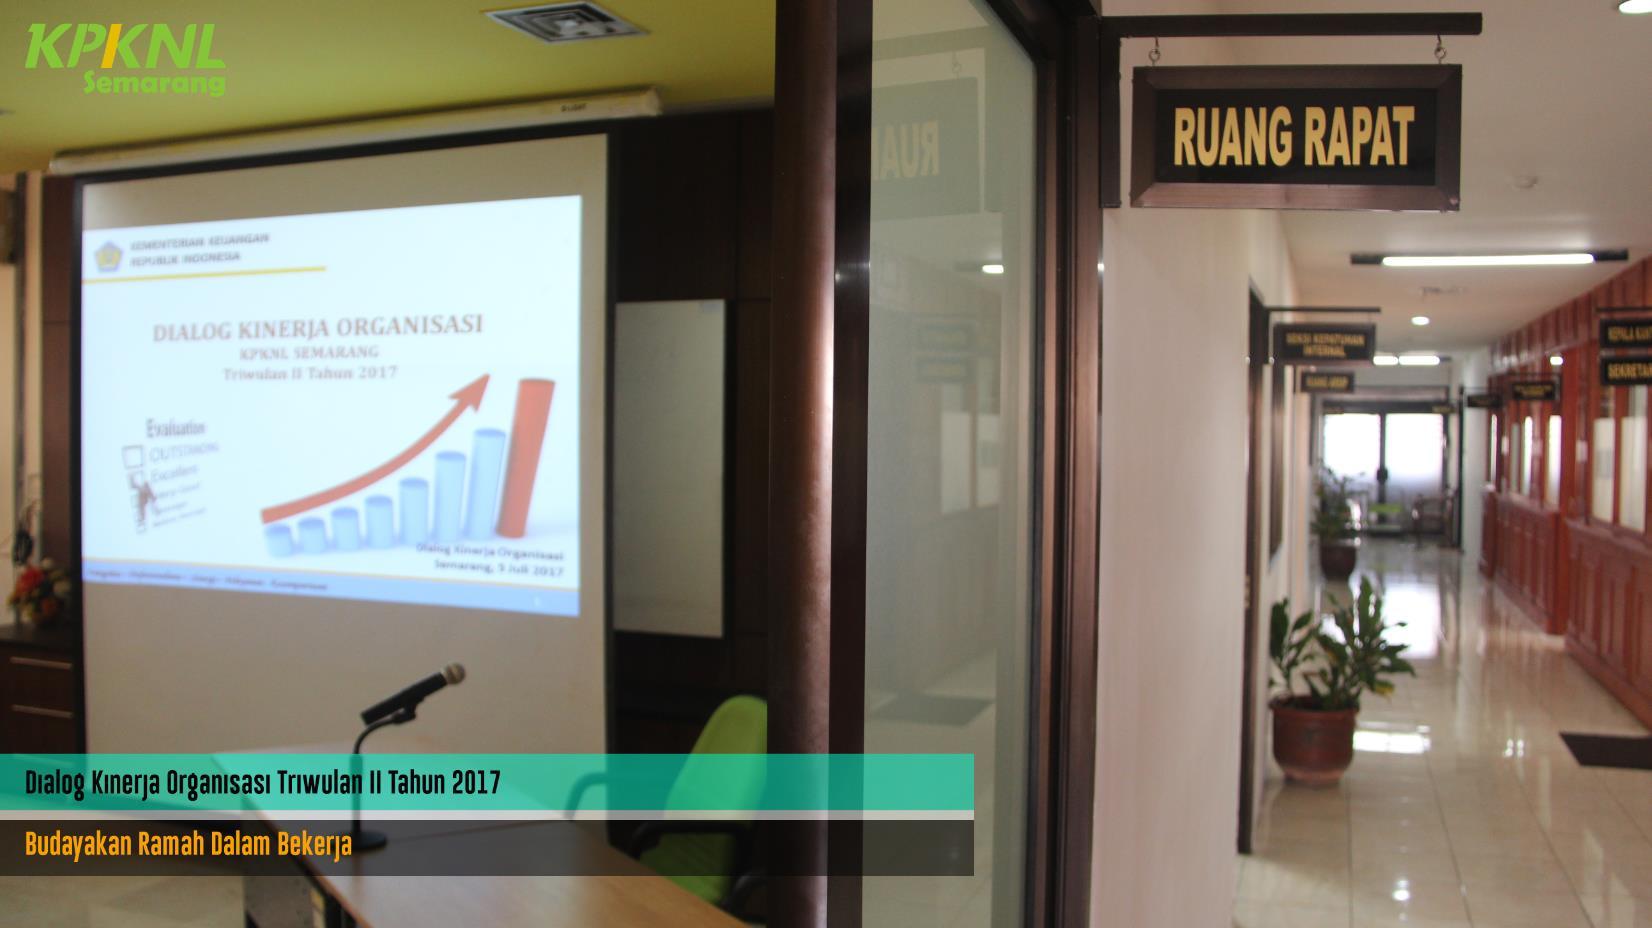 DKO Triwulan II - Budayakan Ramah Dalam Bekerja